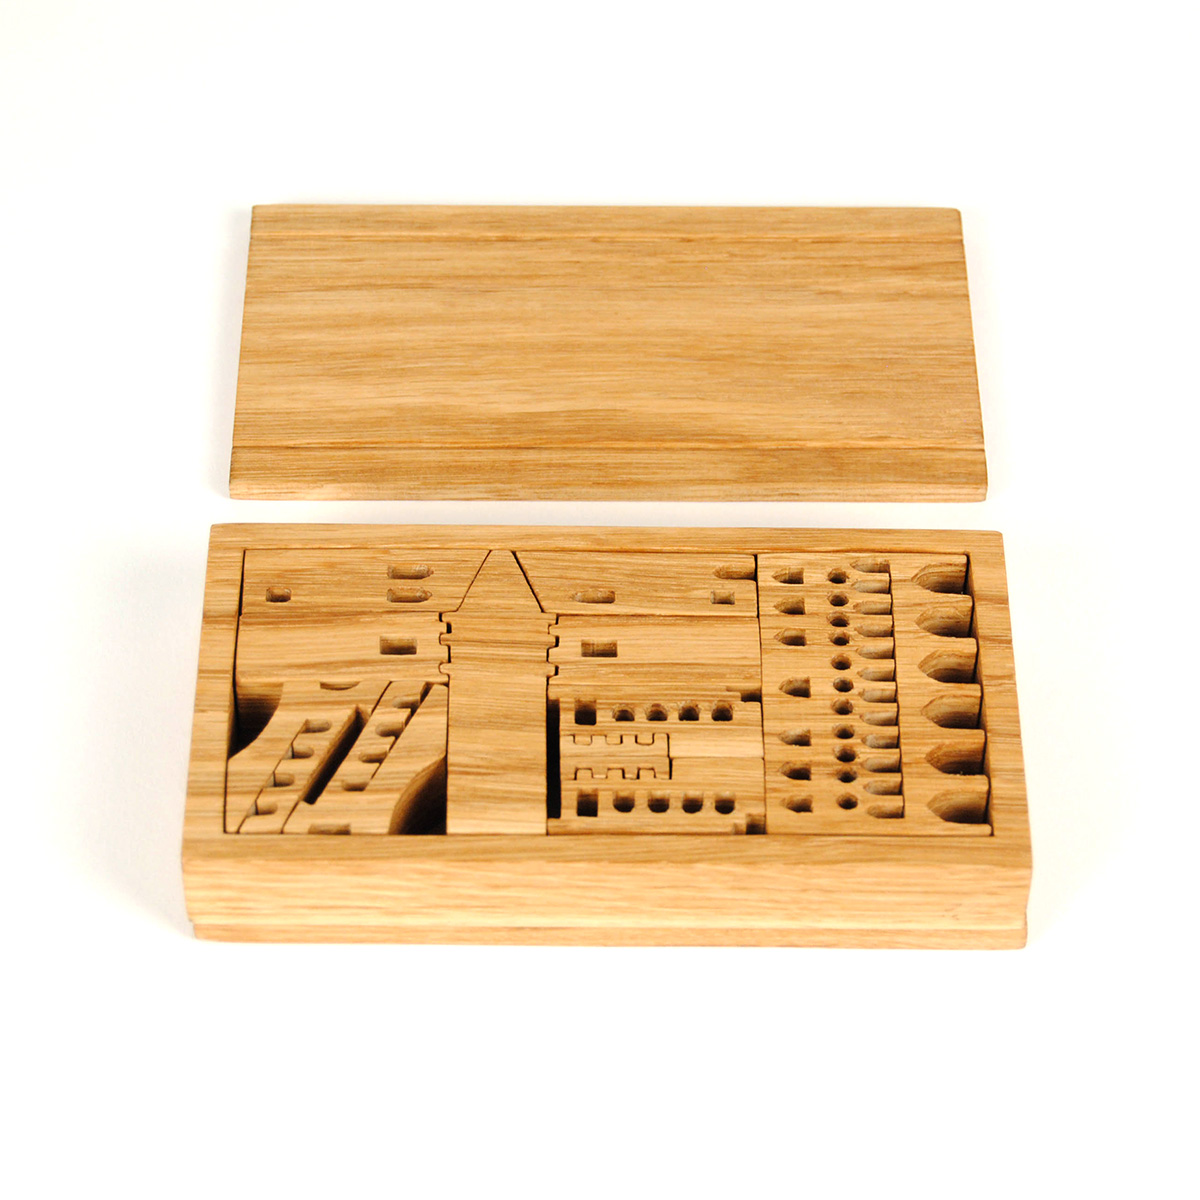 venezia-modellino-design-tangram-venice-design